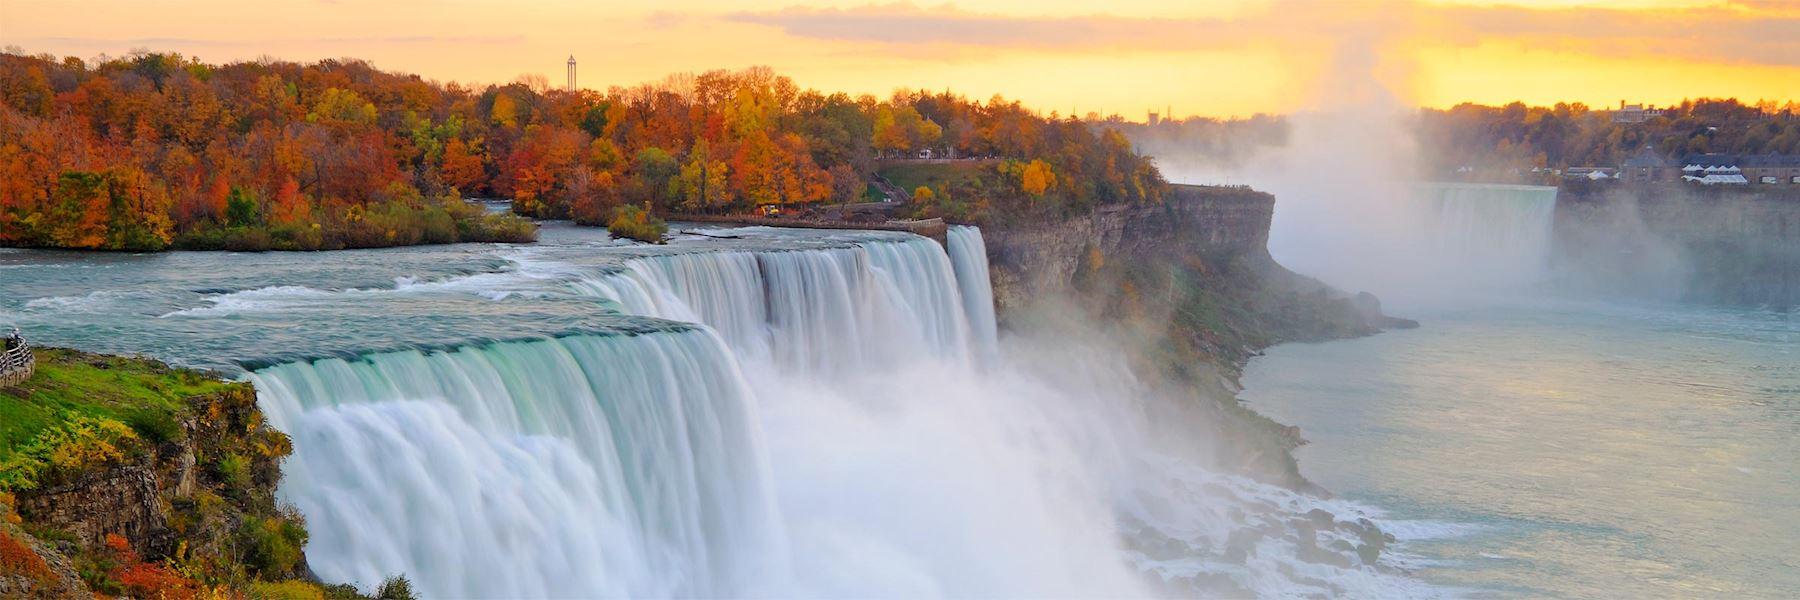 Visit Niagara Falls, USA